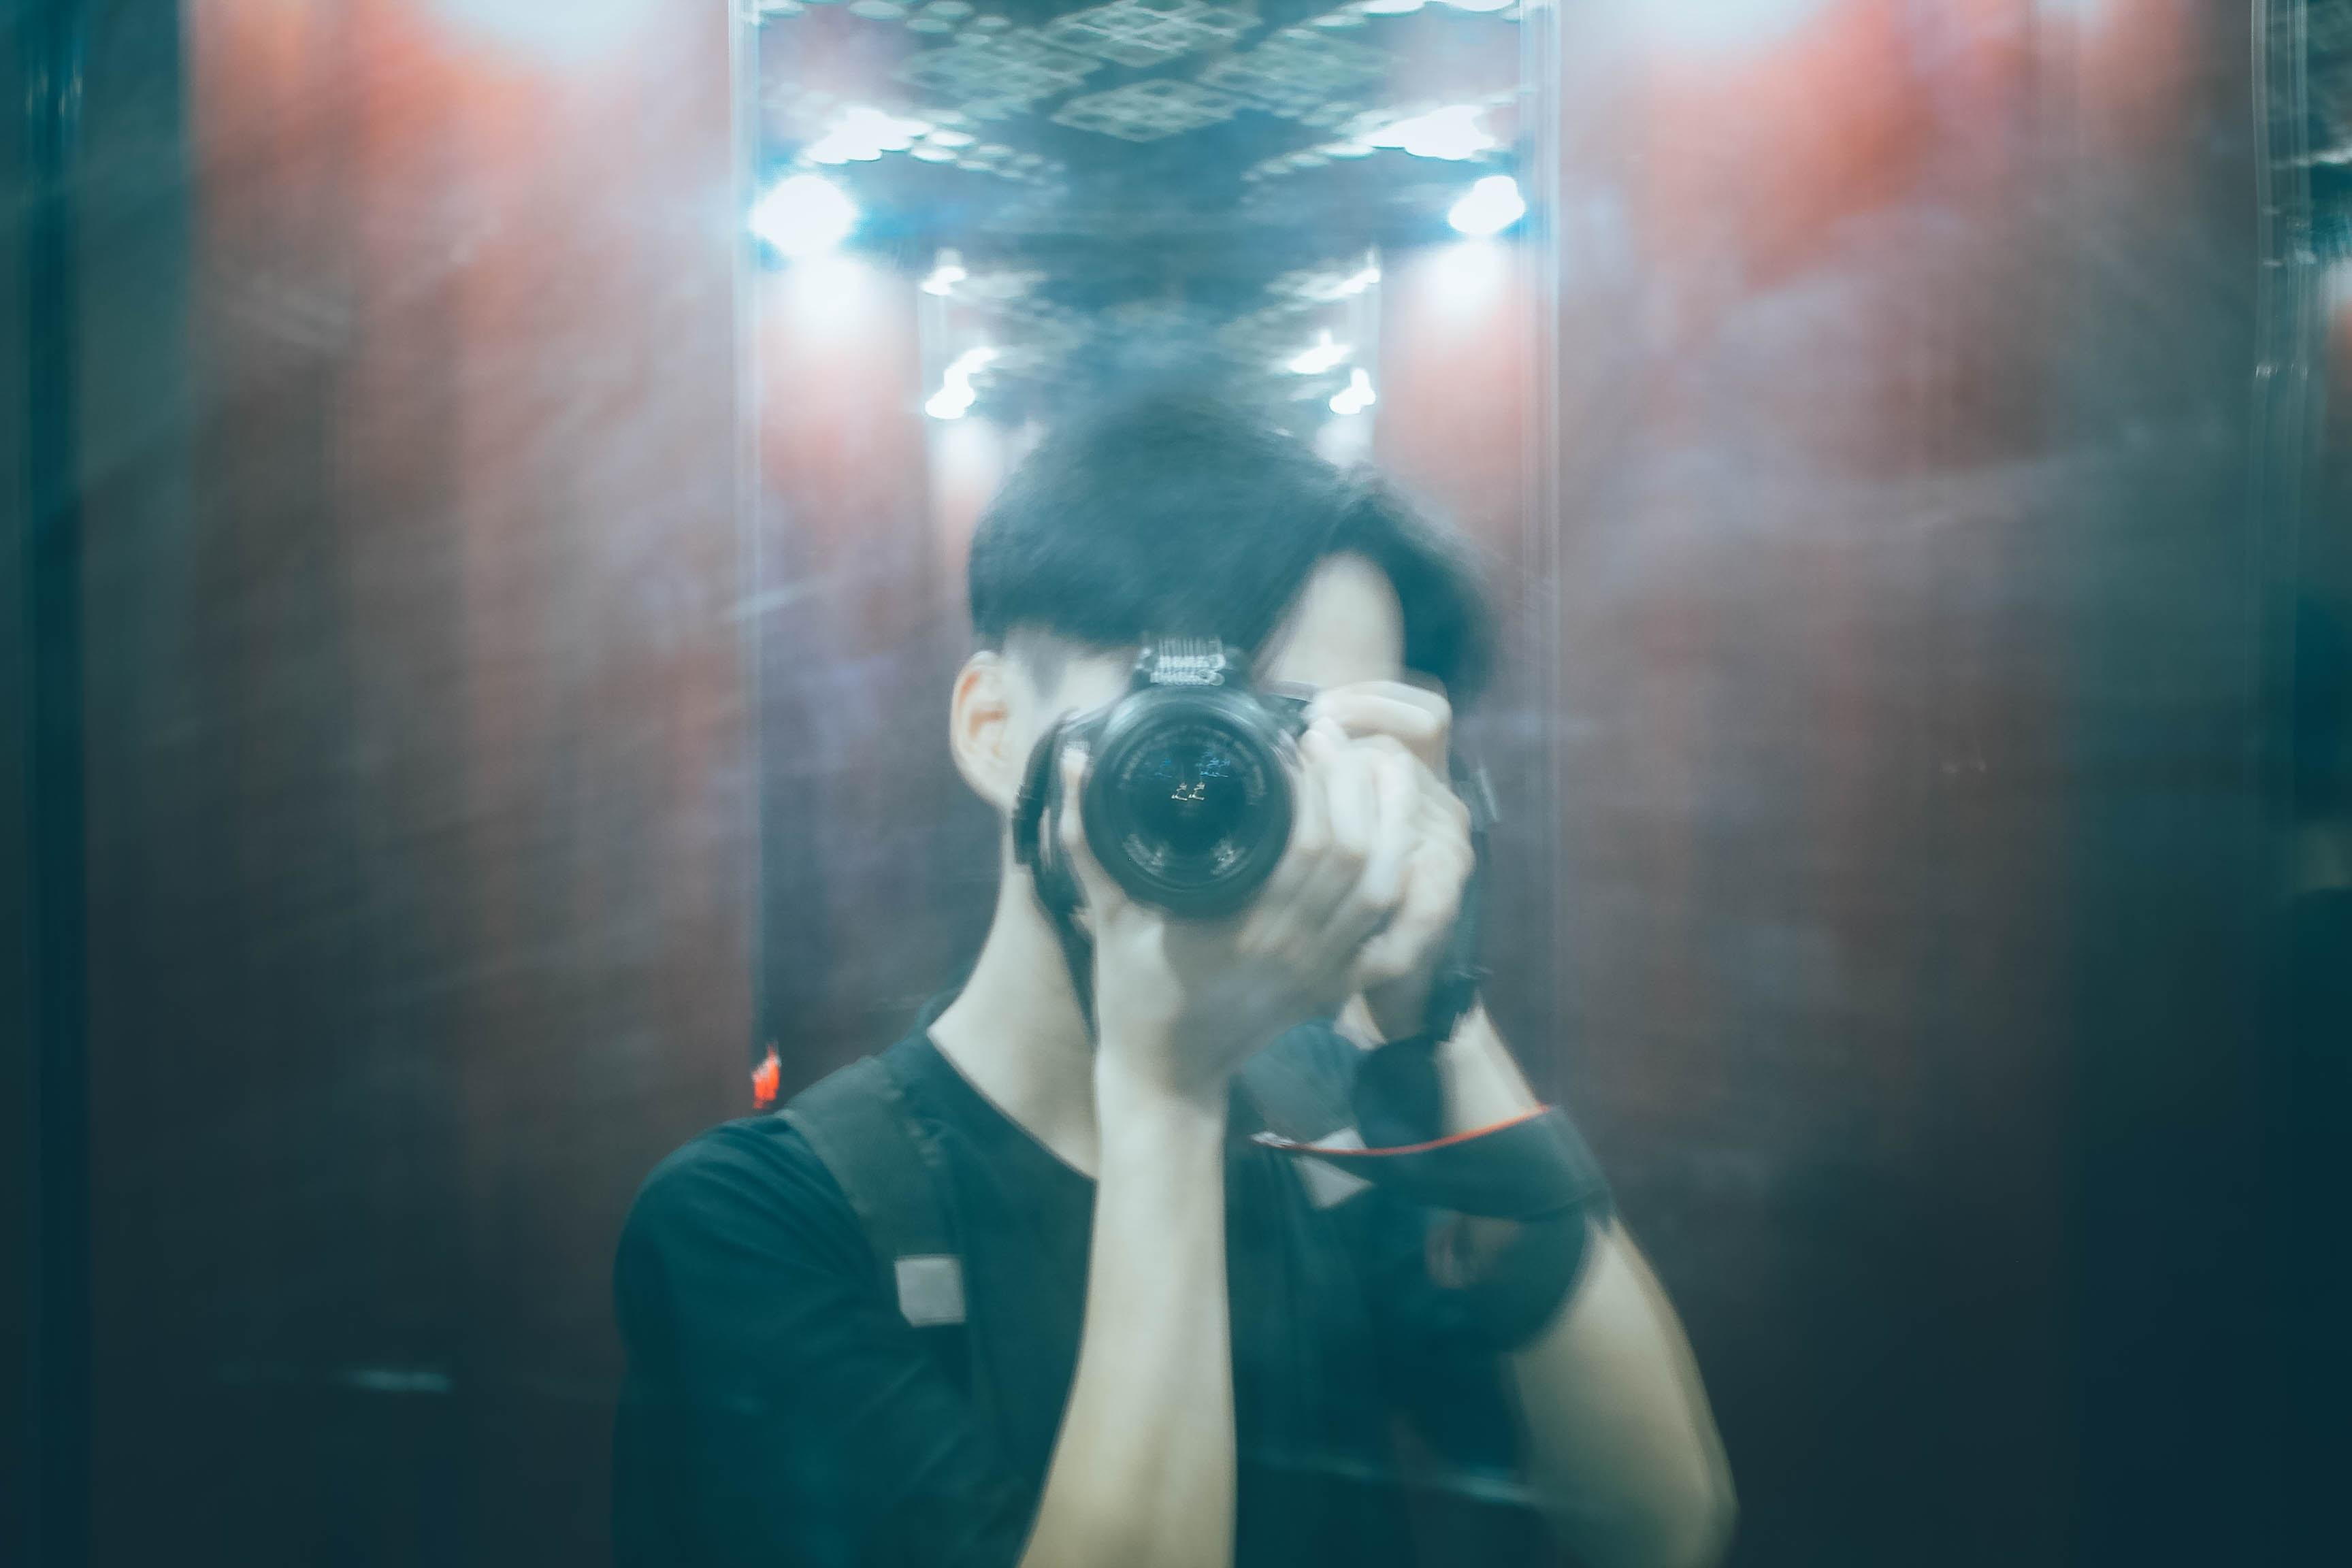 Go to Nguyên Thanh Hiển's profile